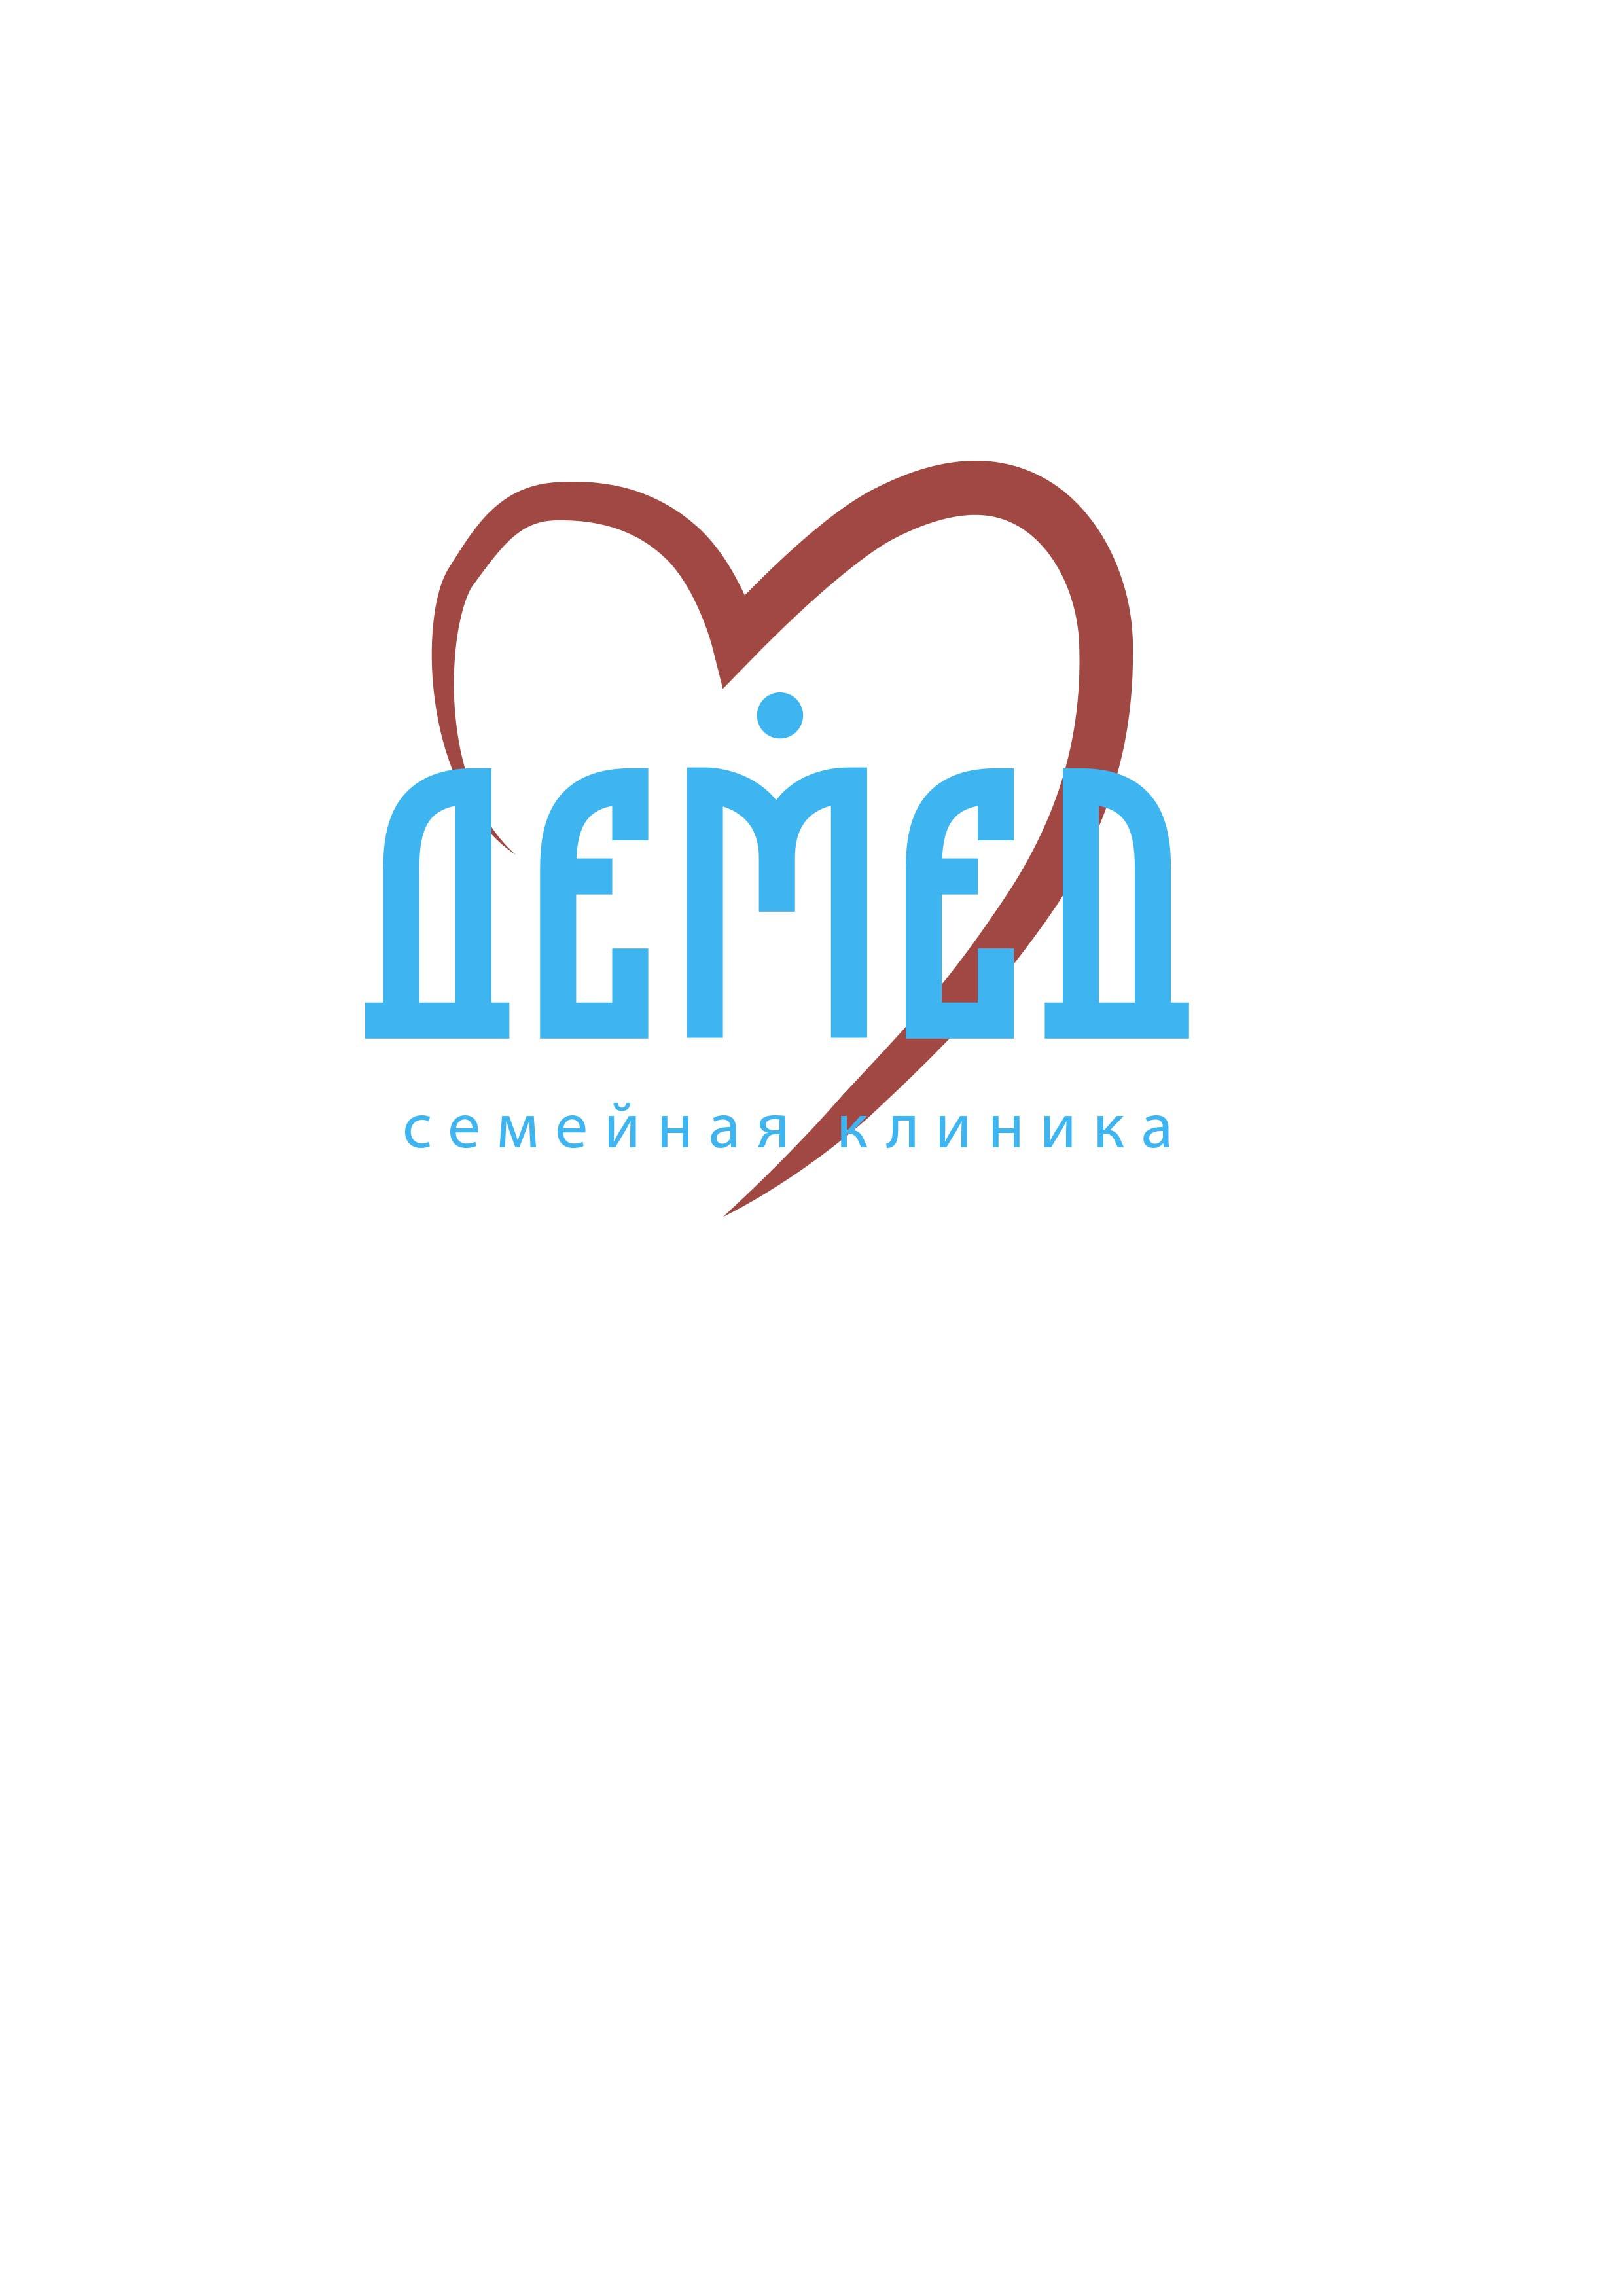 Логотип медицинского центра фото f_0825dca5ba0cd206.jpg